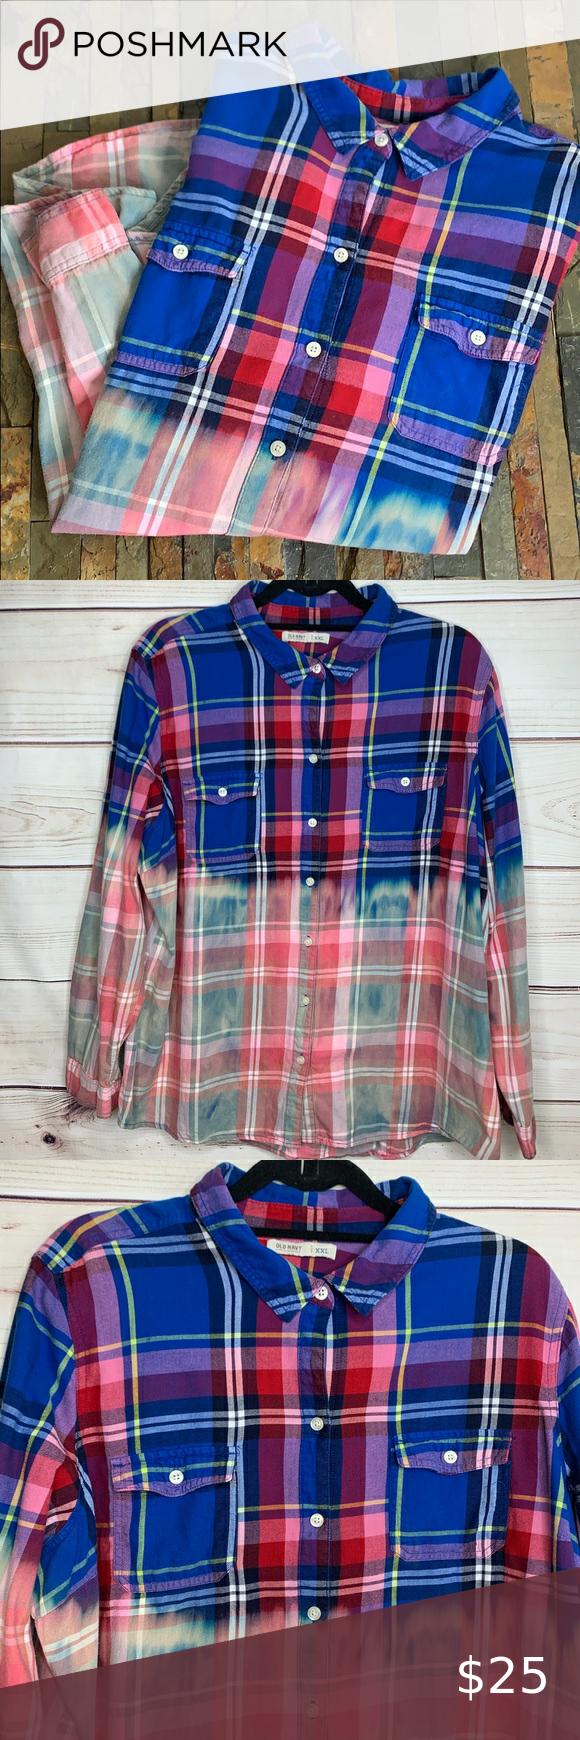 Old Navy Custom Bleach Dyed Blue Flannel Shirt Blue Flannel Shirt Flannel Shirt Bleach Dye [ 1740 x 580 Pixel ]